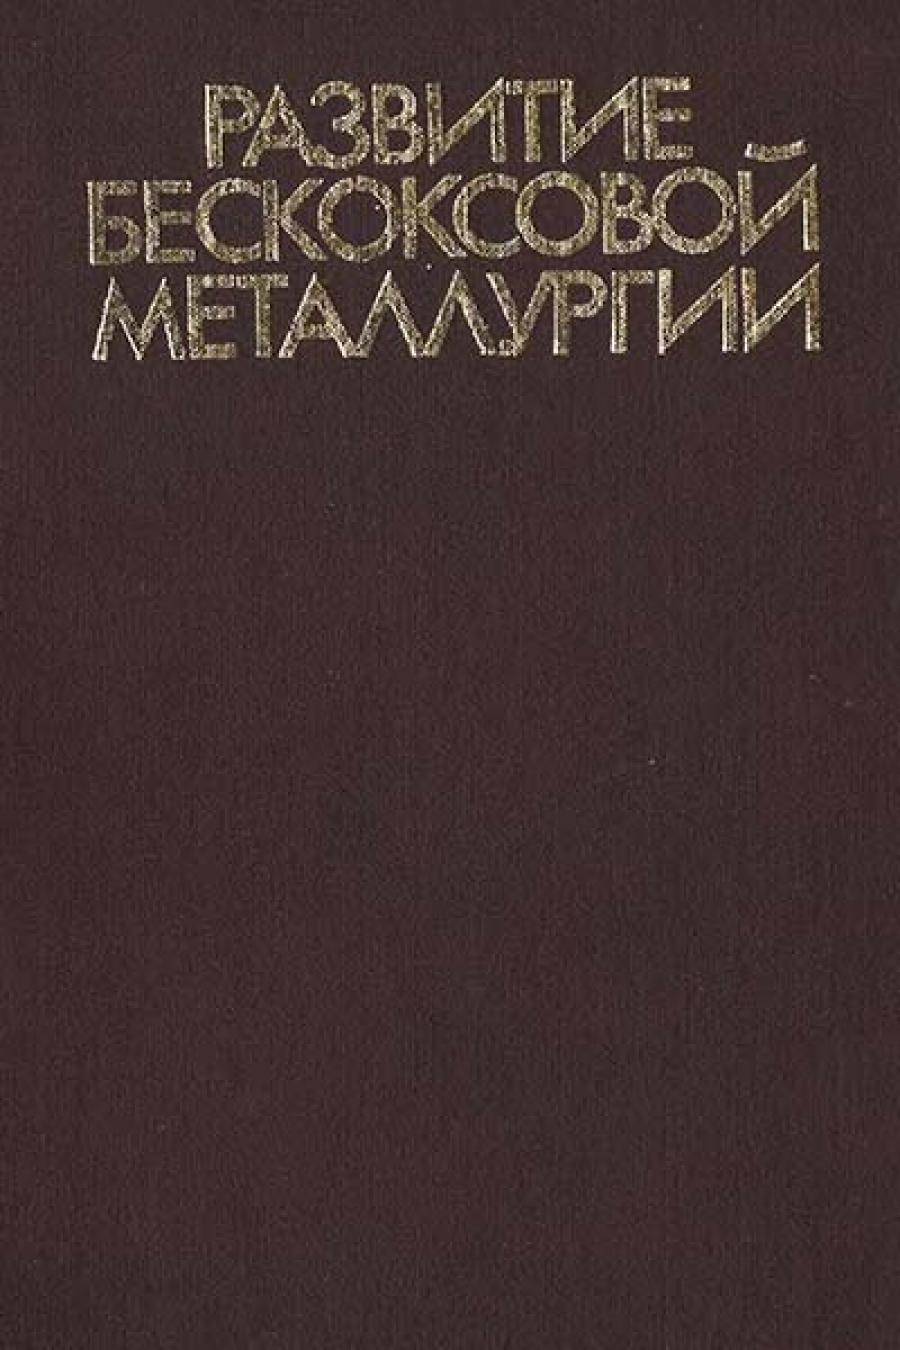 реферативный журнал металлургия